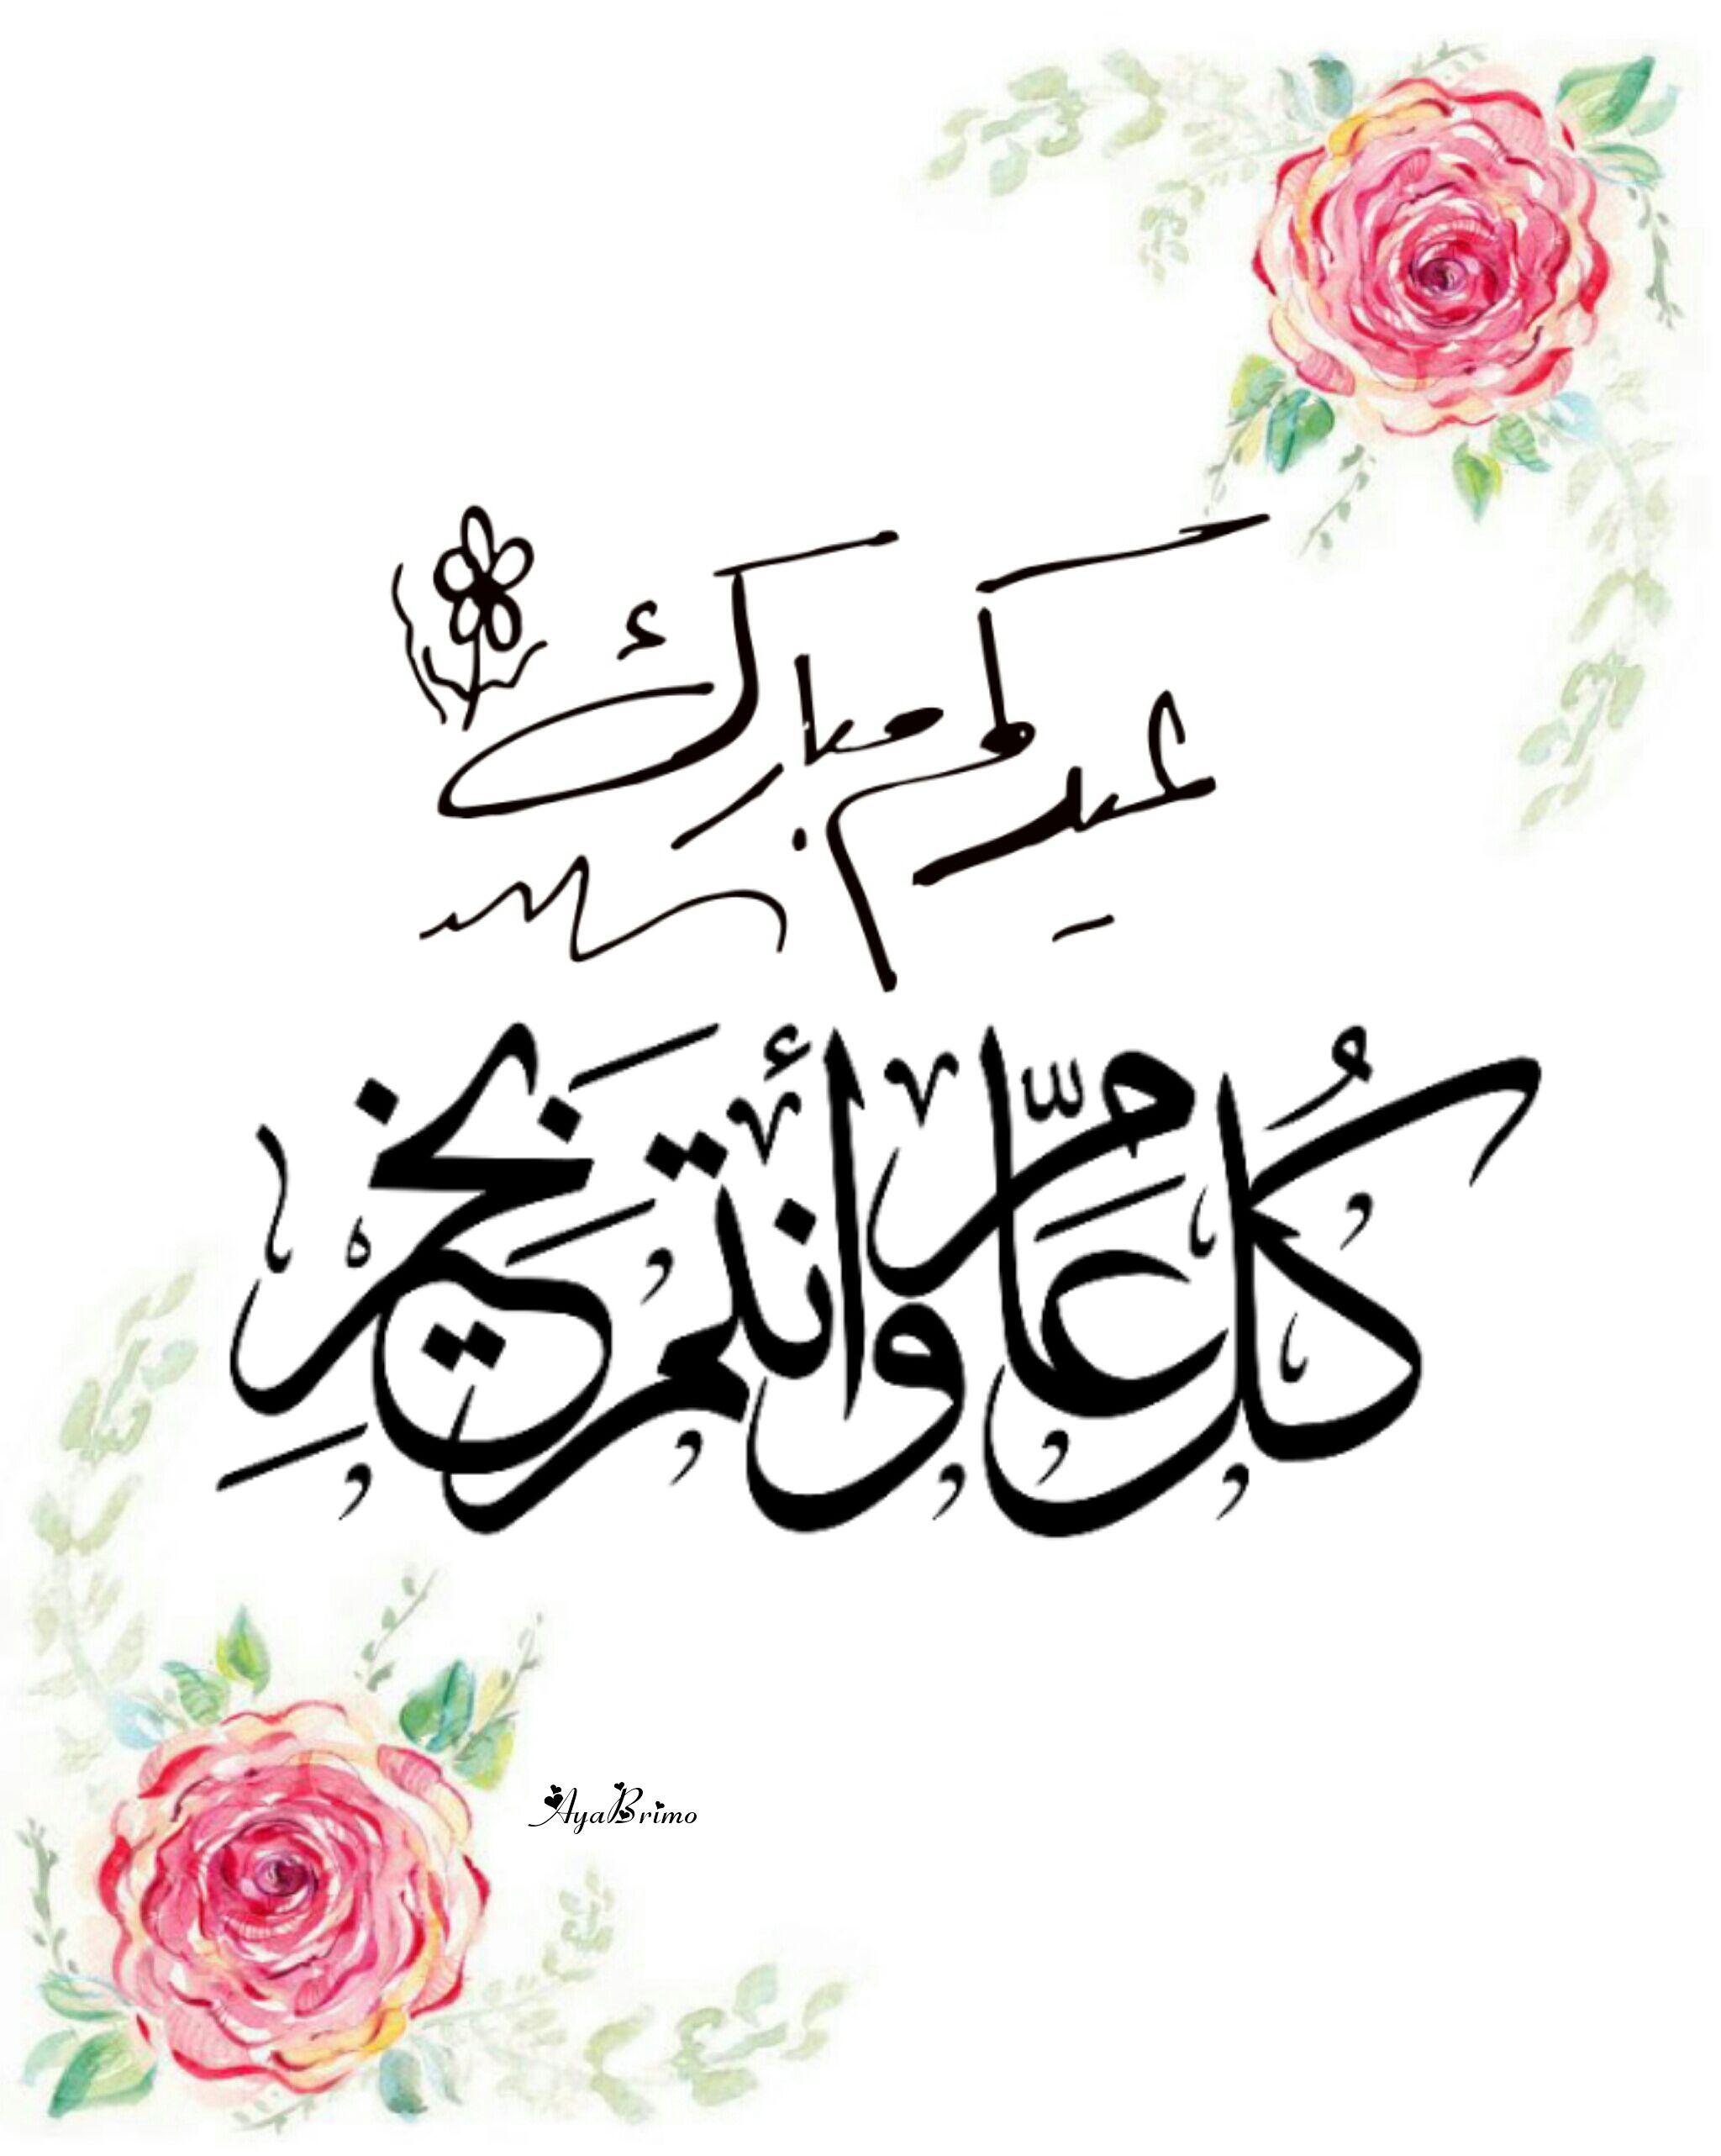 عيد مبارك كل عام وأنتم بخير Art Calligraphy Arabic Calligraphy